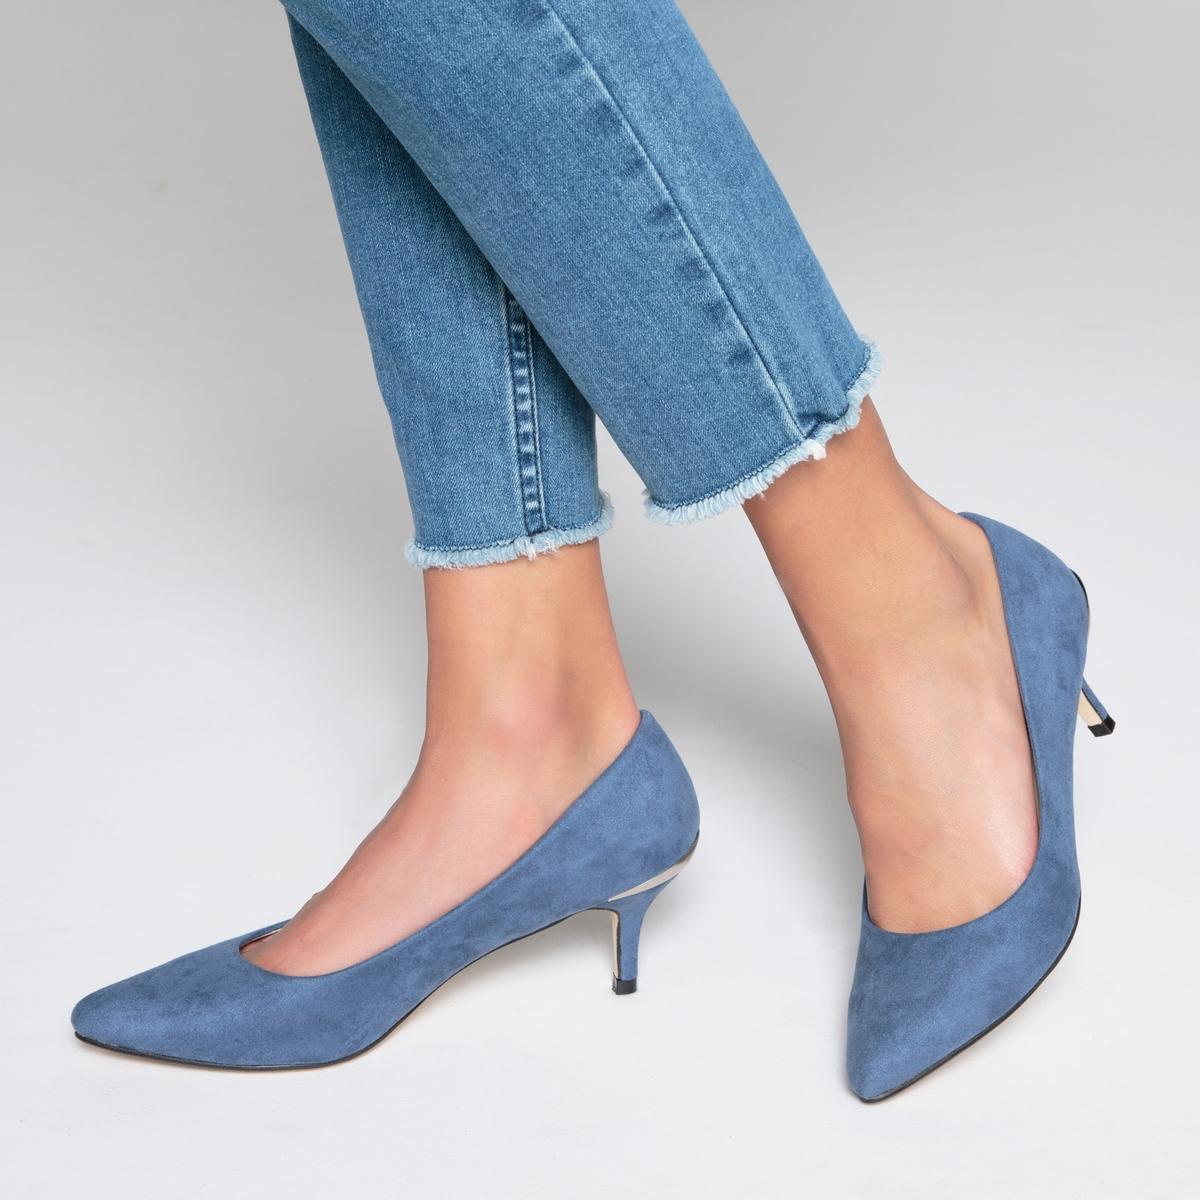 Туфли на каблуке kitten heel туфли la strada туфли на каблуке